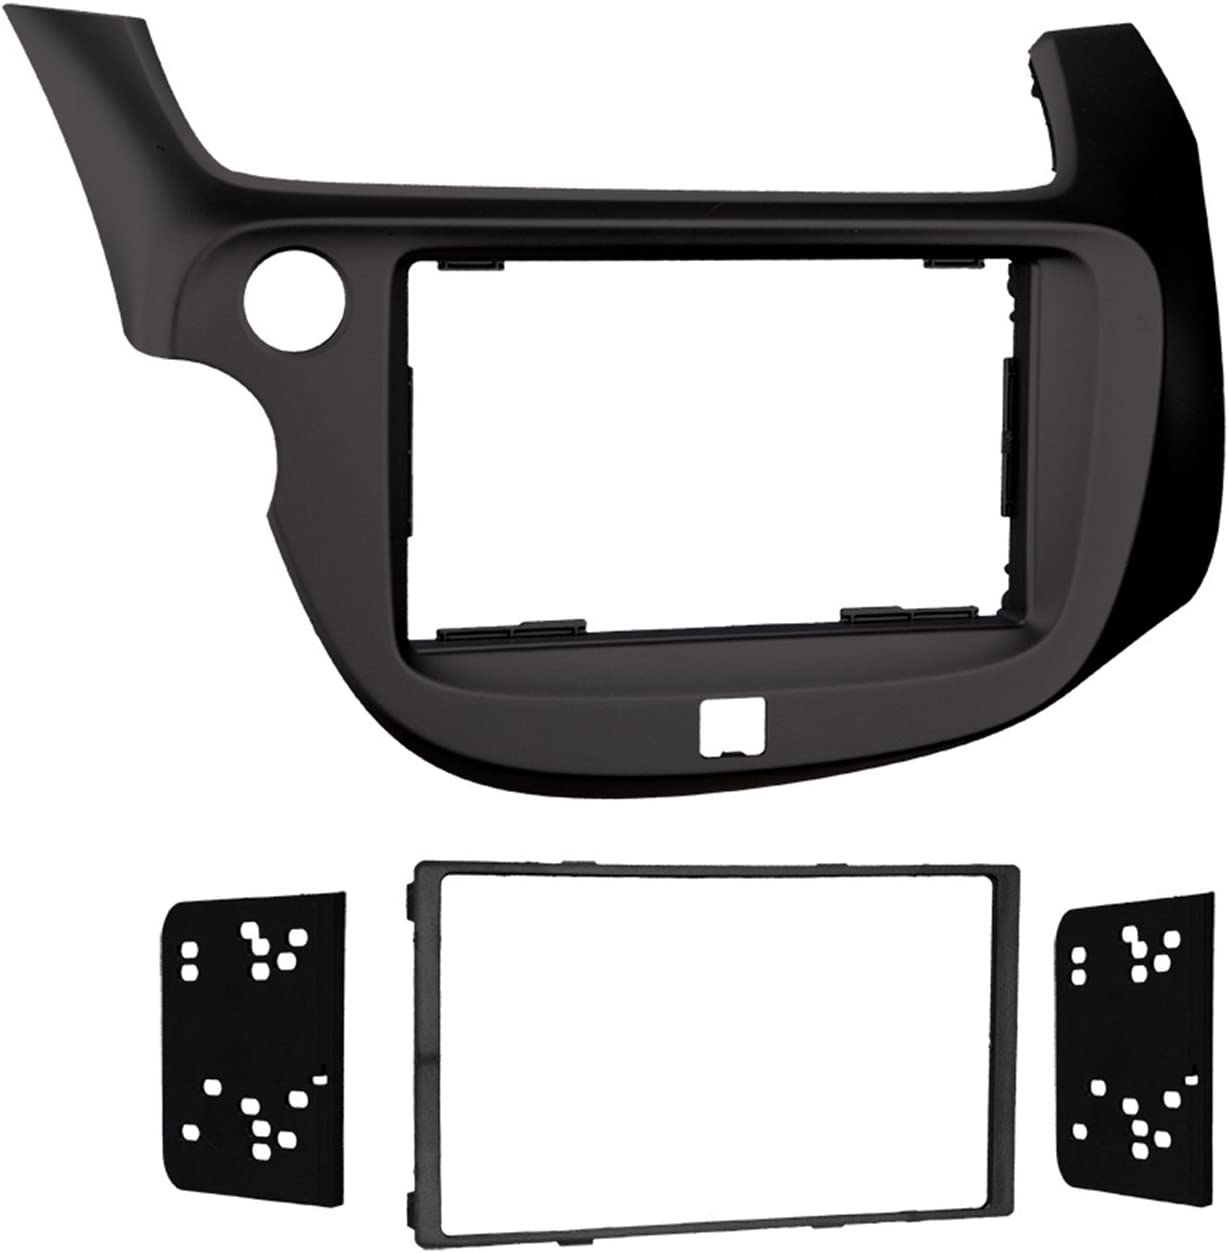 Honda Fit Vehicles Matte Black 95-7877B Metra Installation Kit for Select 2009